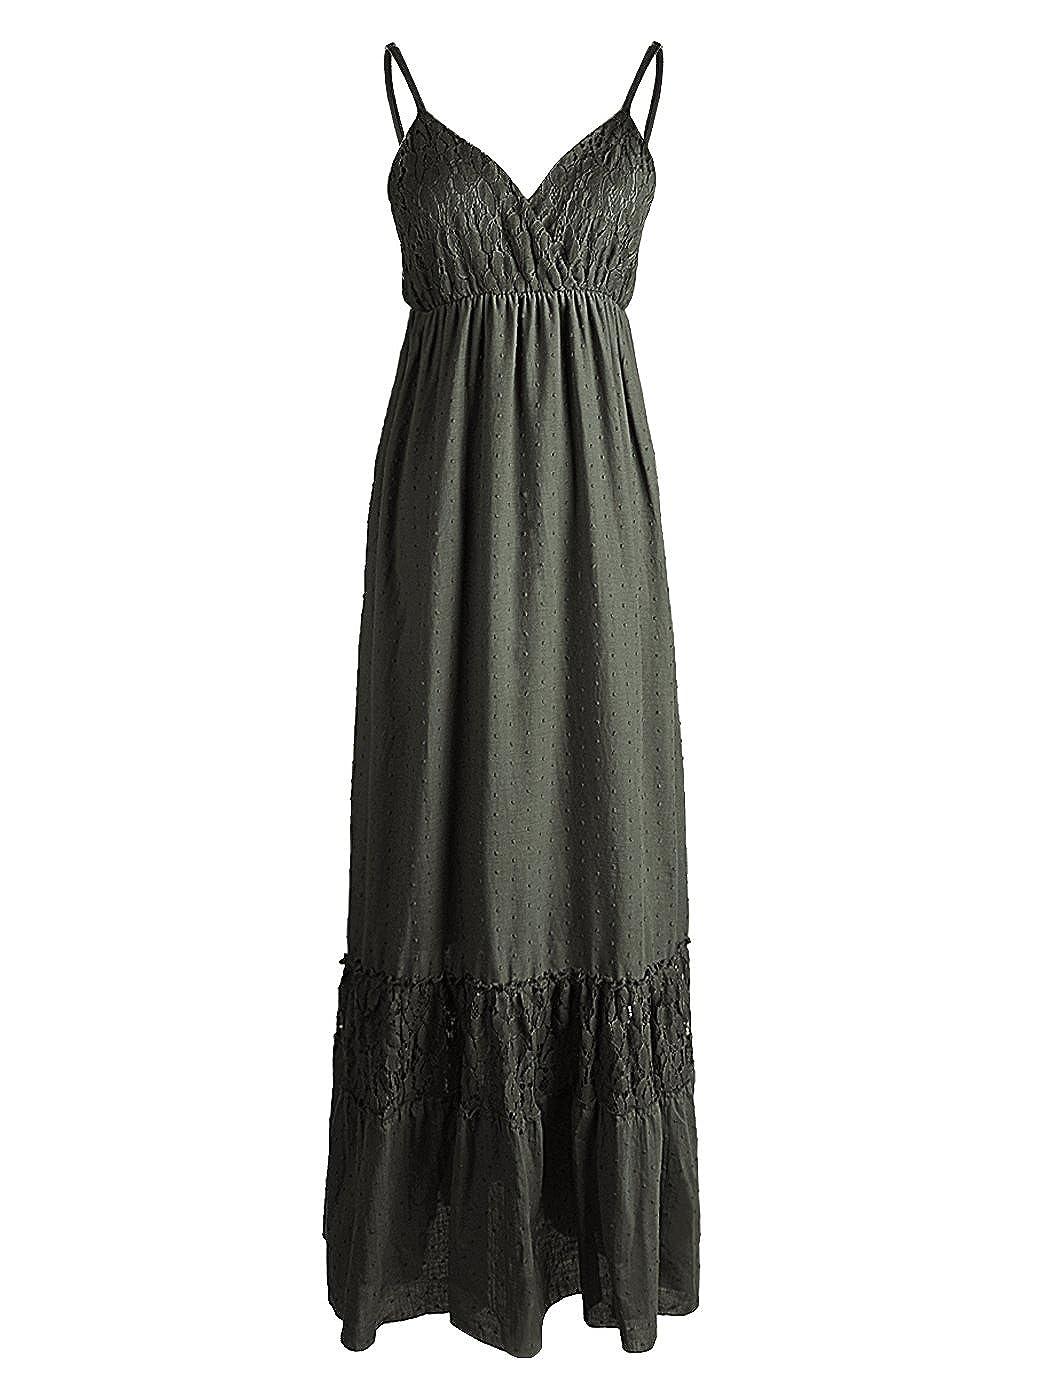 Anna-Kaci Womens Adjustable Strap Boho Lace White Sleeveless Long Maxi Dress